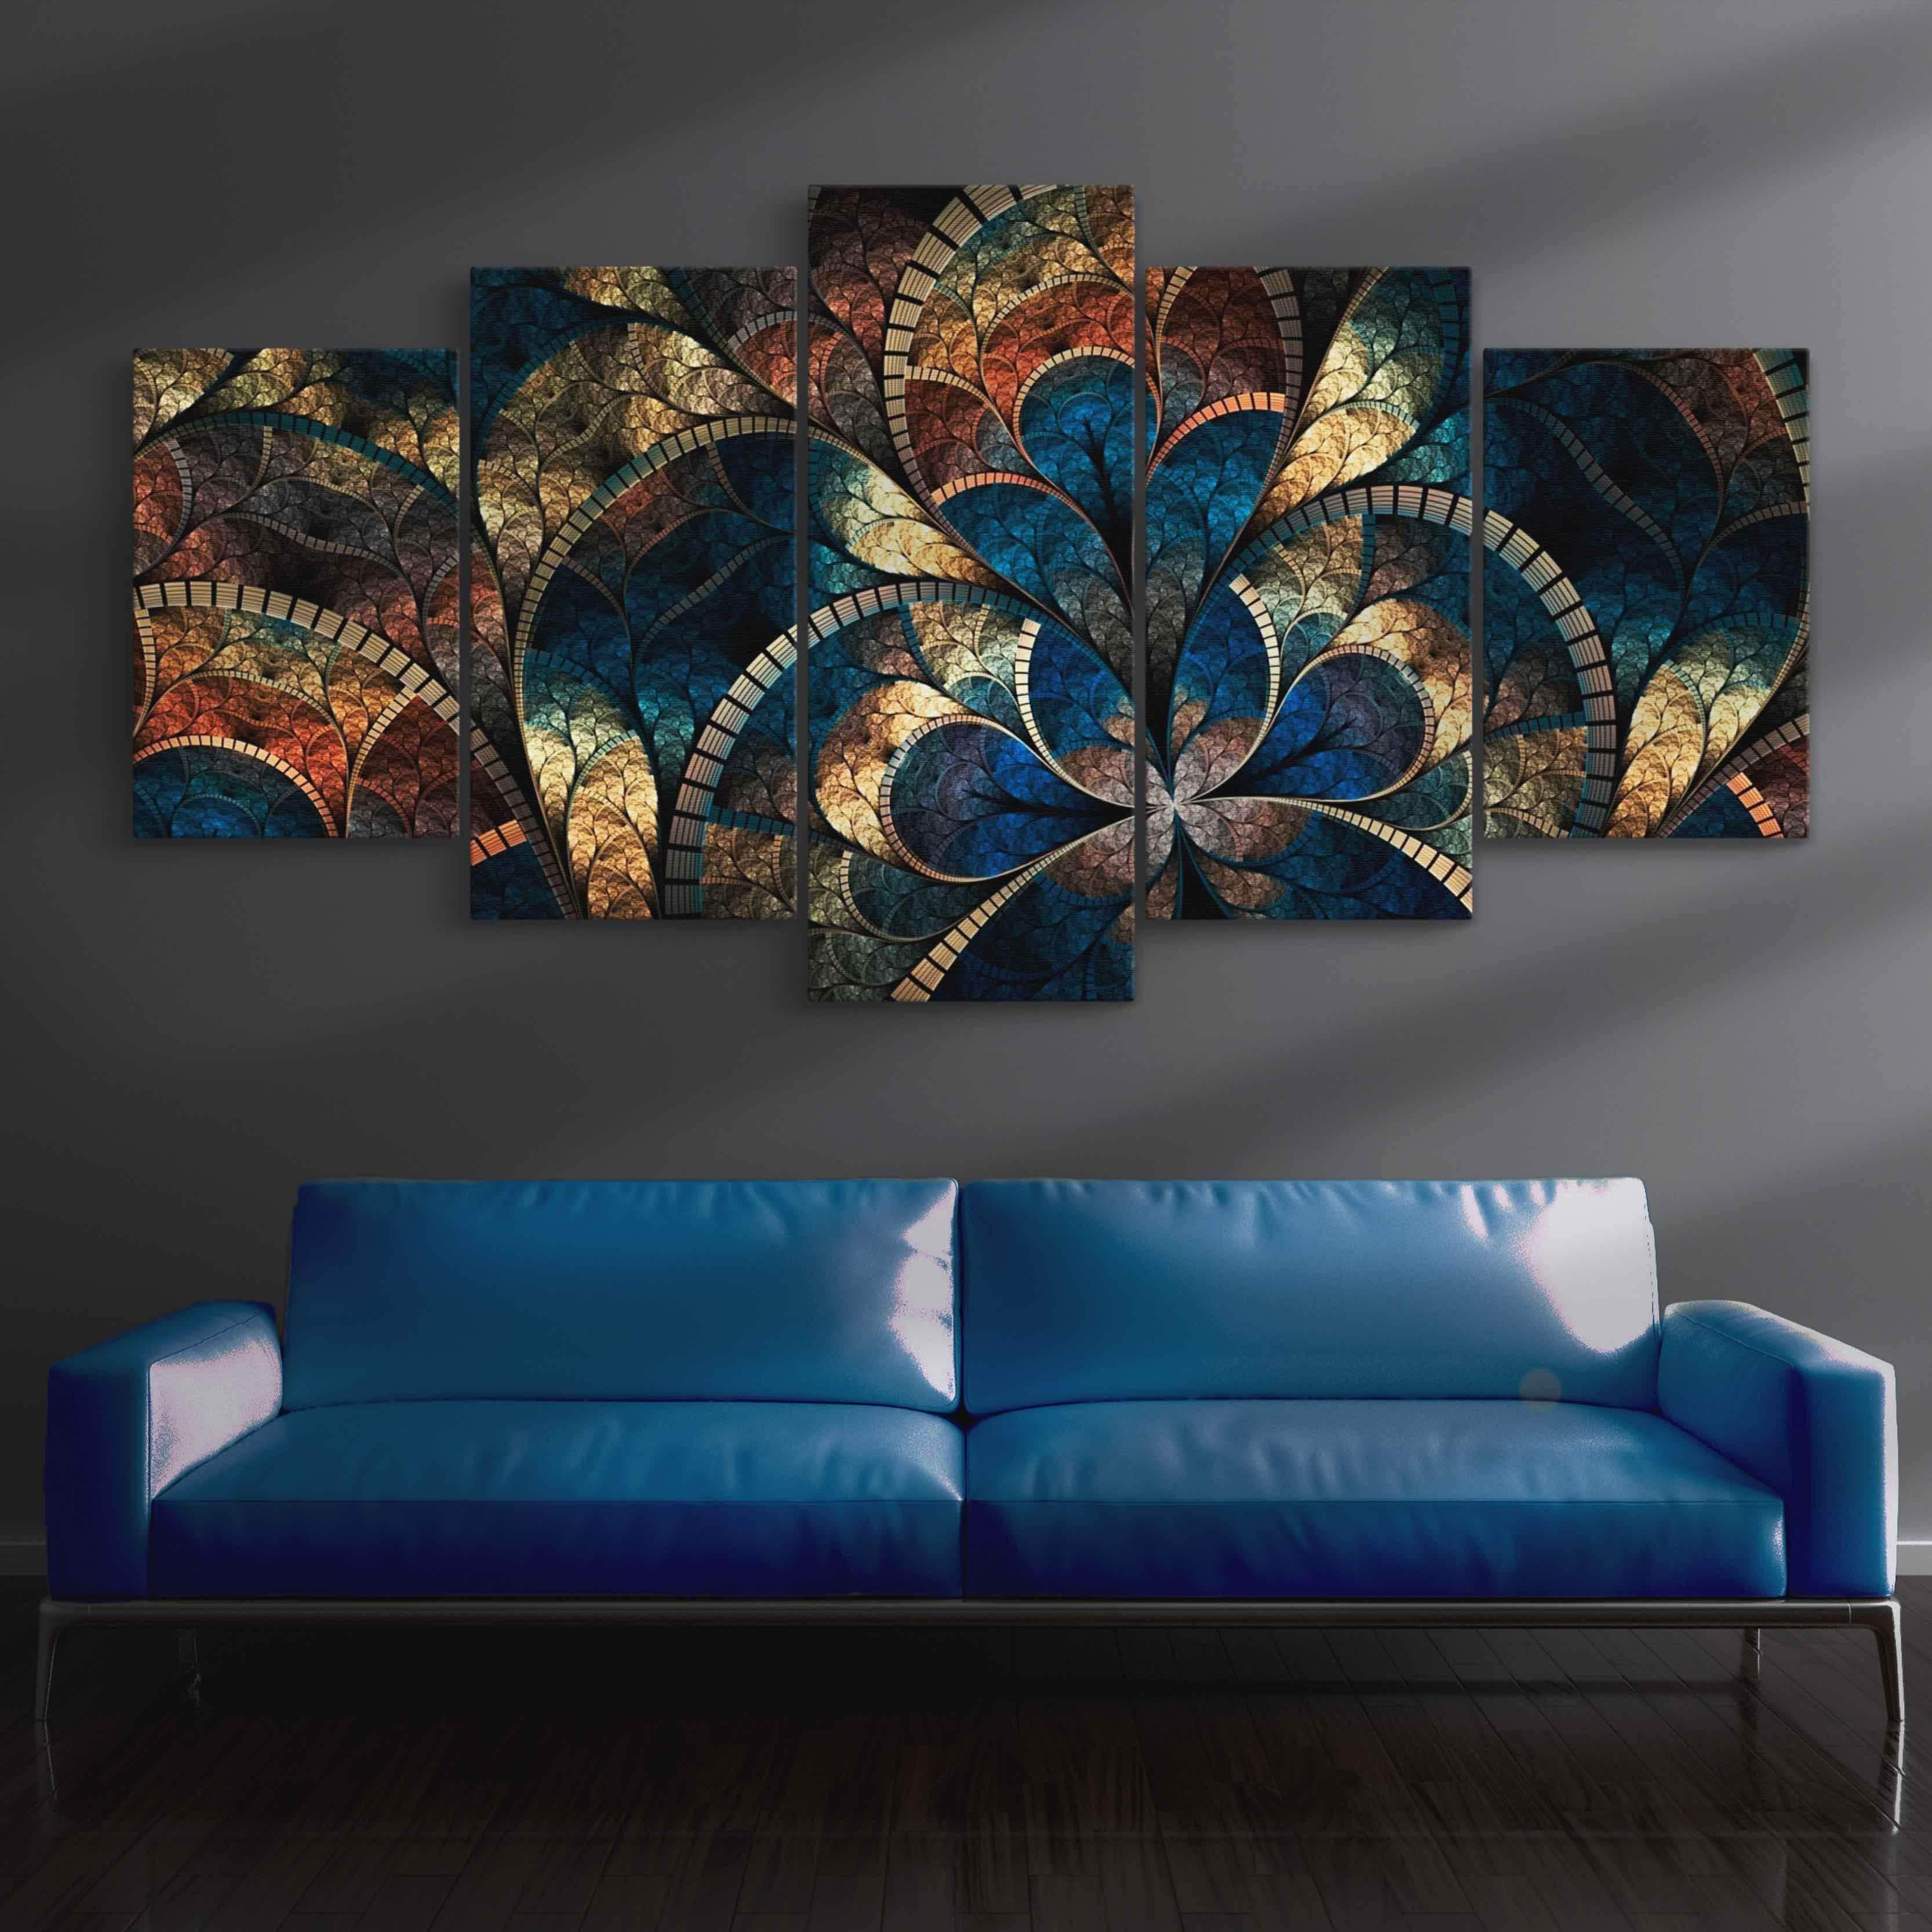 Abstract Art Canvas 5 panel wall art canvas